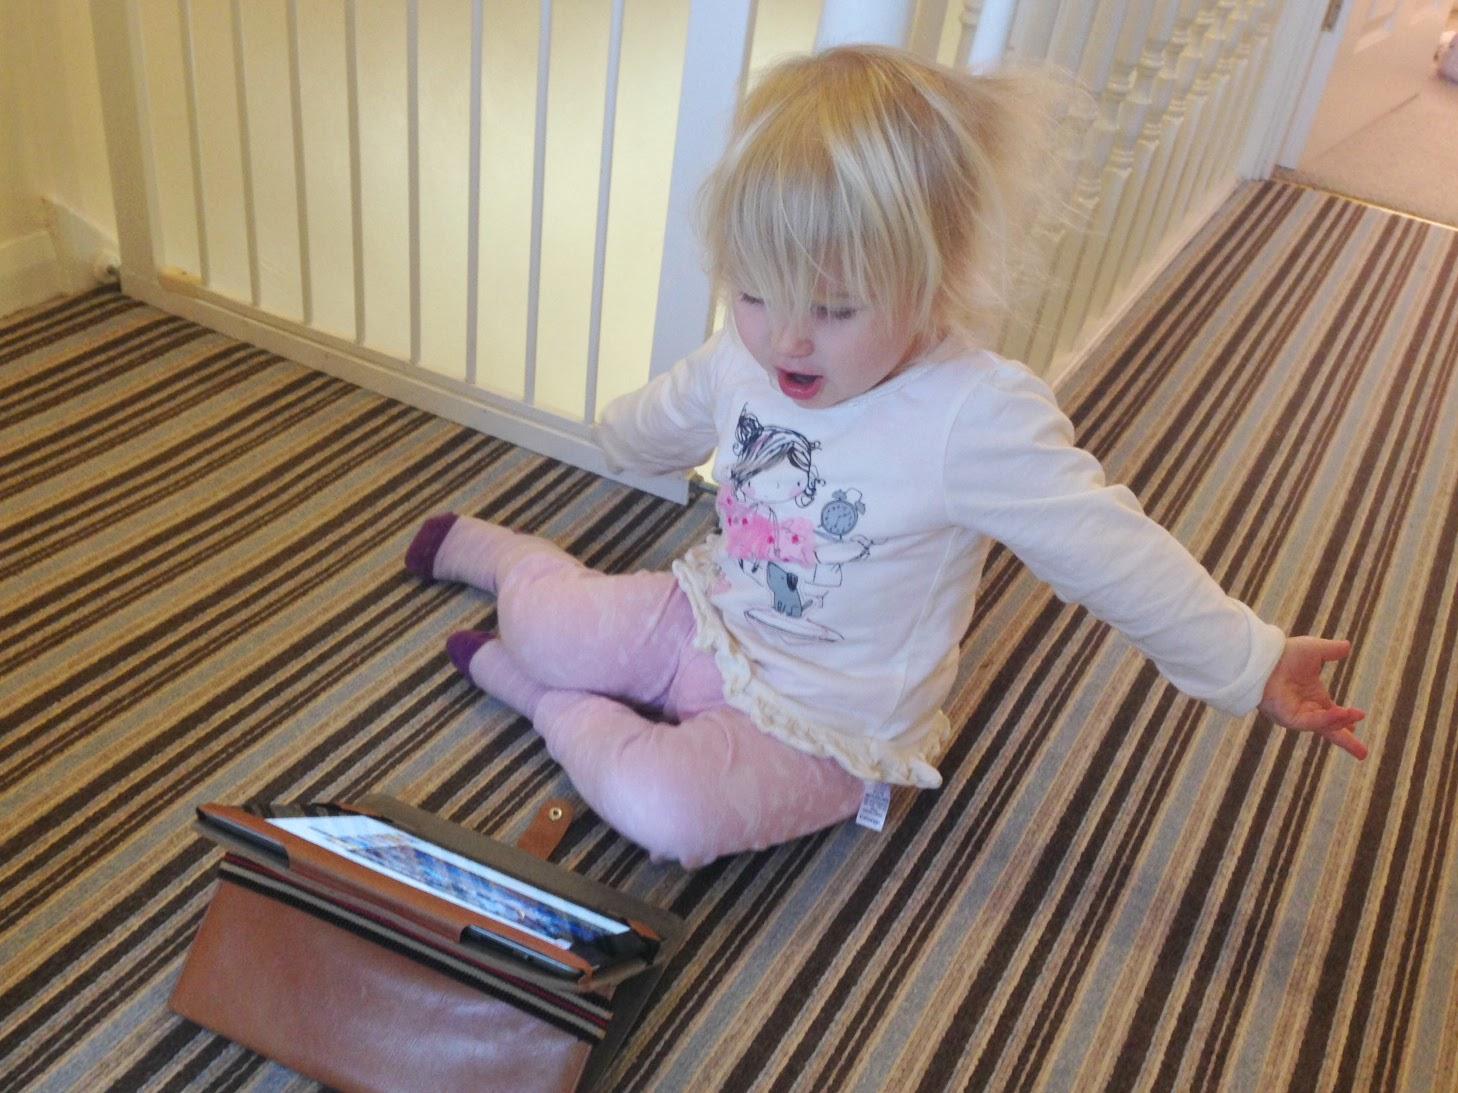 Unhappy looking Tin Box Tot watching YouTube on iPad